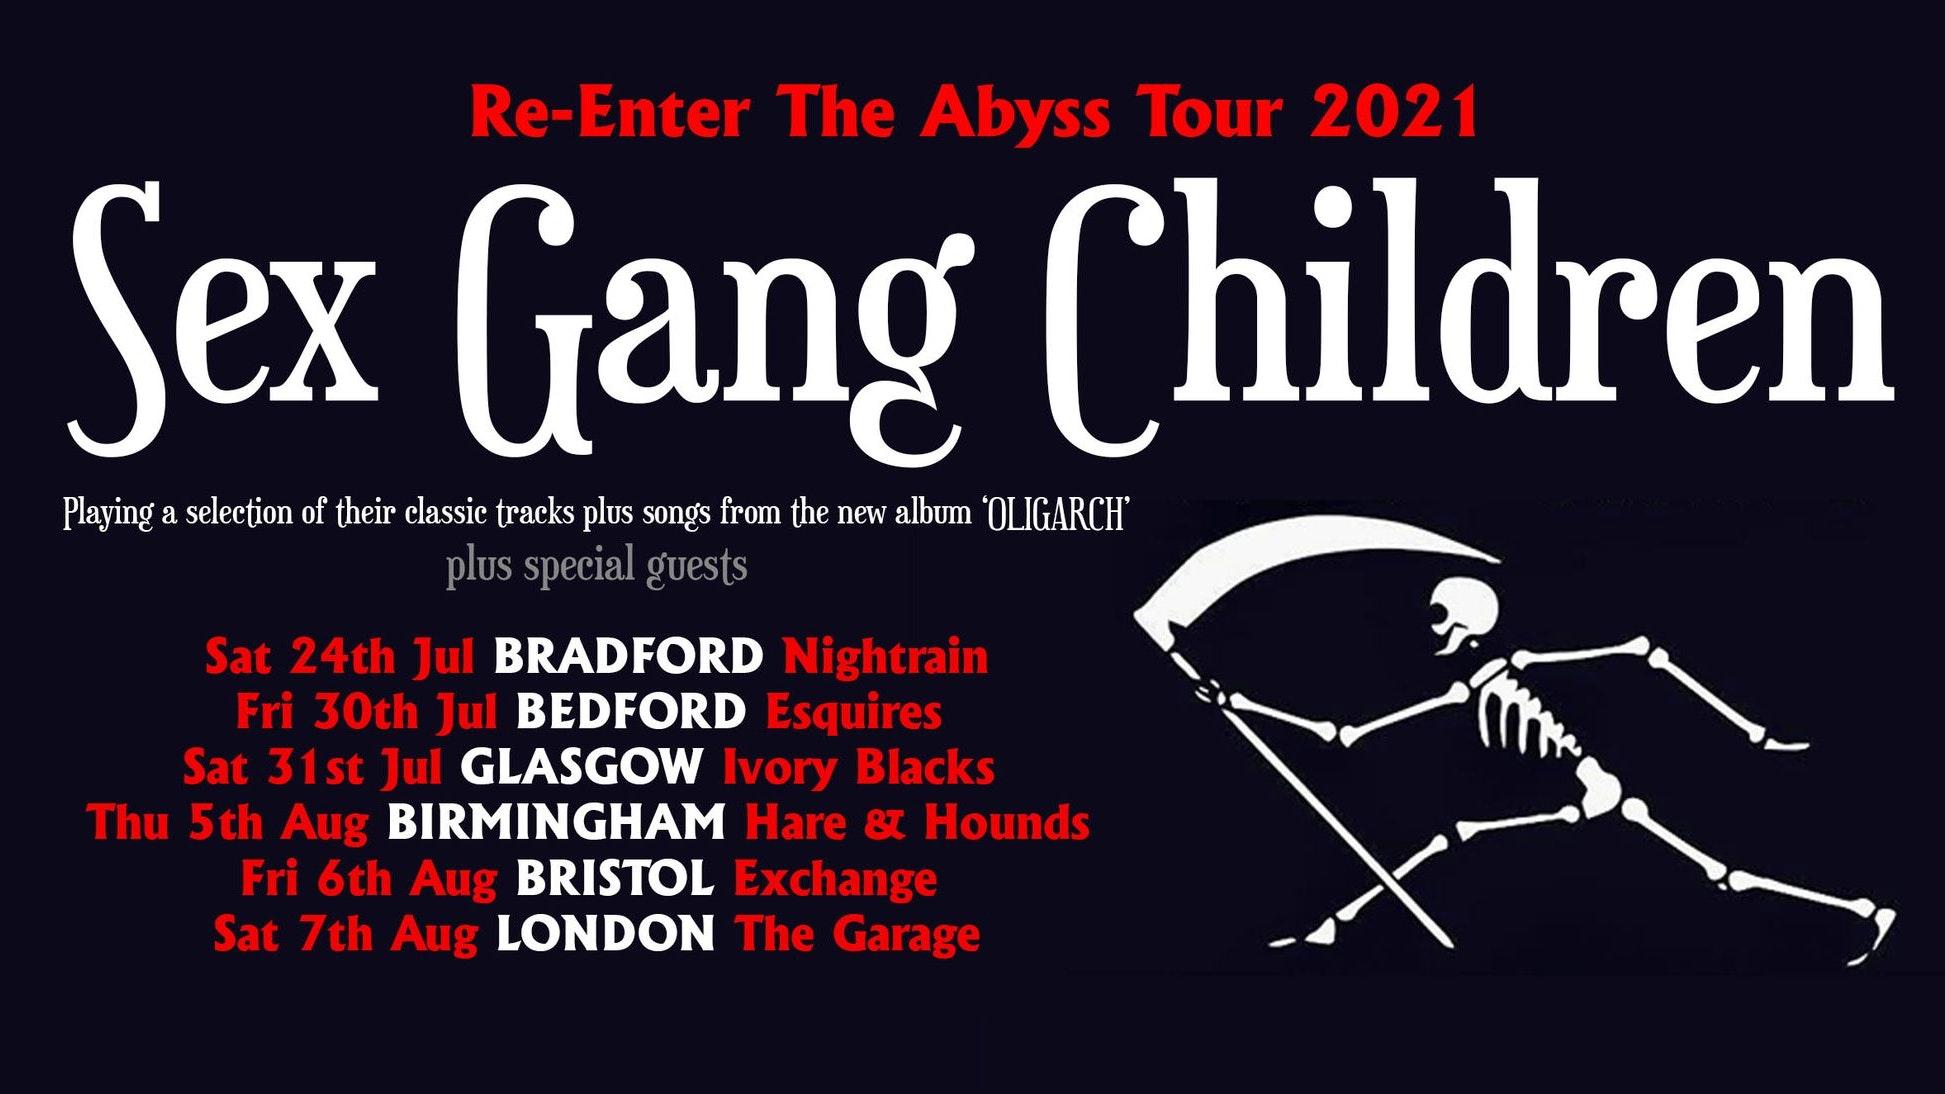 Sex Gang Children Re-Enter The Abyss Tour 2021 – London